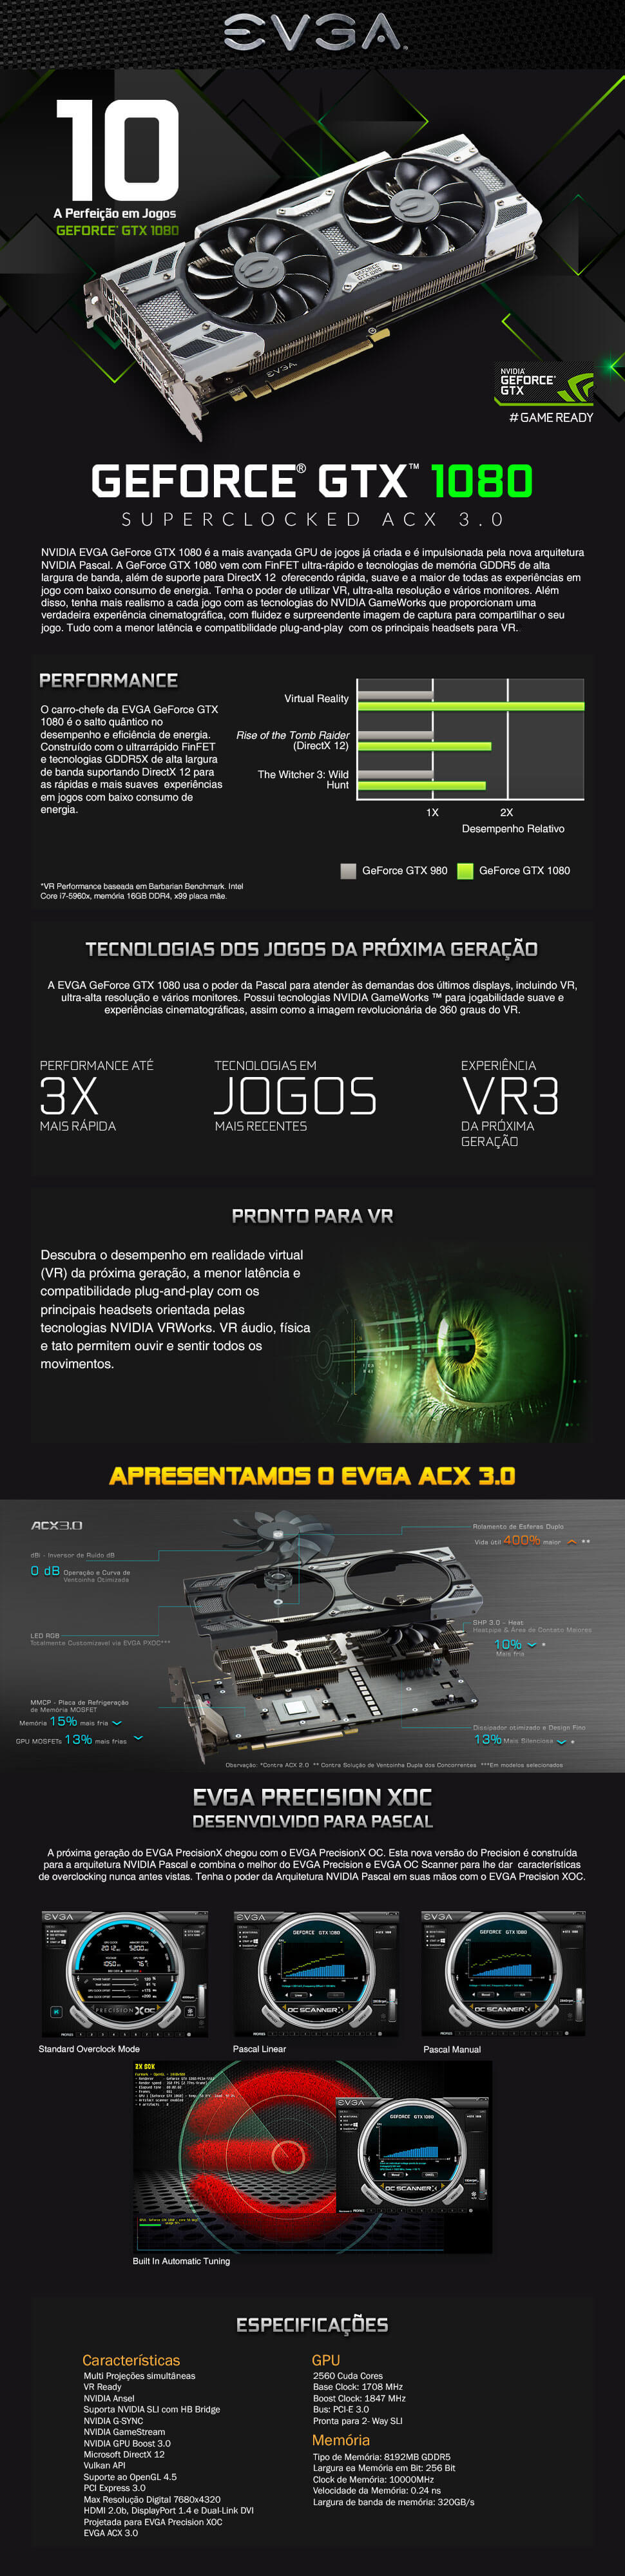 Recursos Placa de Vídeo EVGA GeForce GTX 1080 SC Gaming ACX 3.0 8GB GDDR5X PCI-Express 3.0 08G-P4-6183-KR